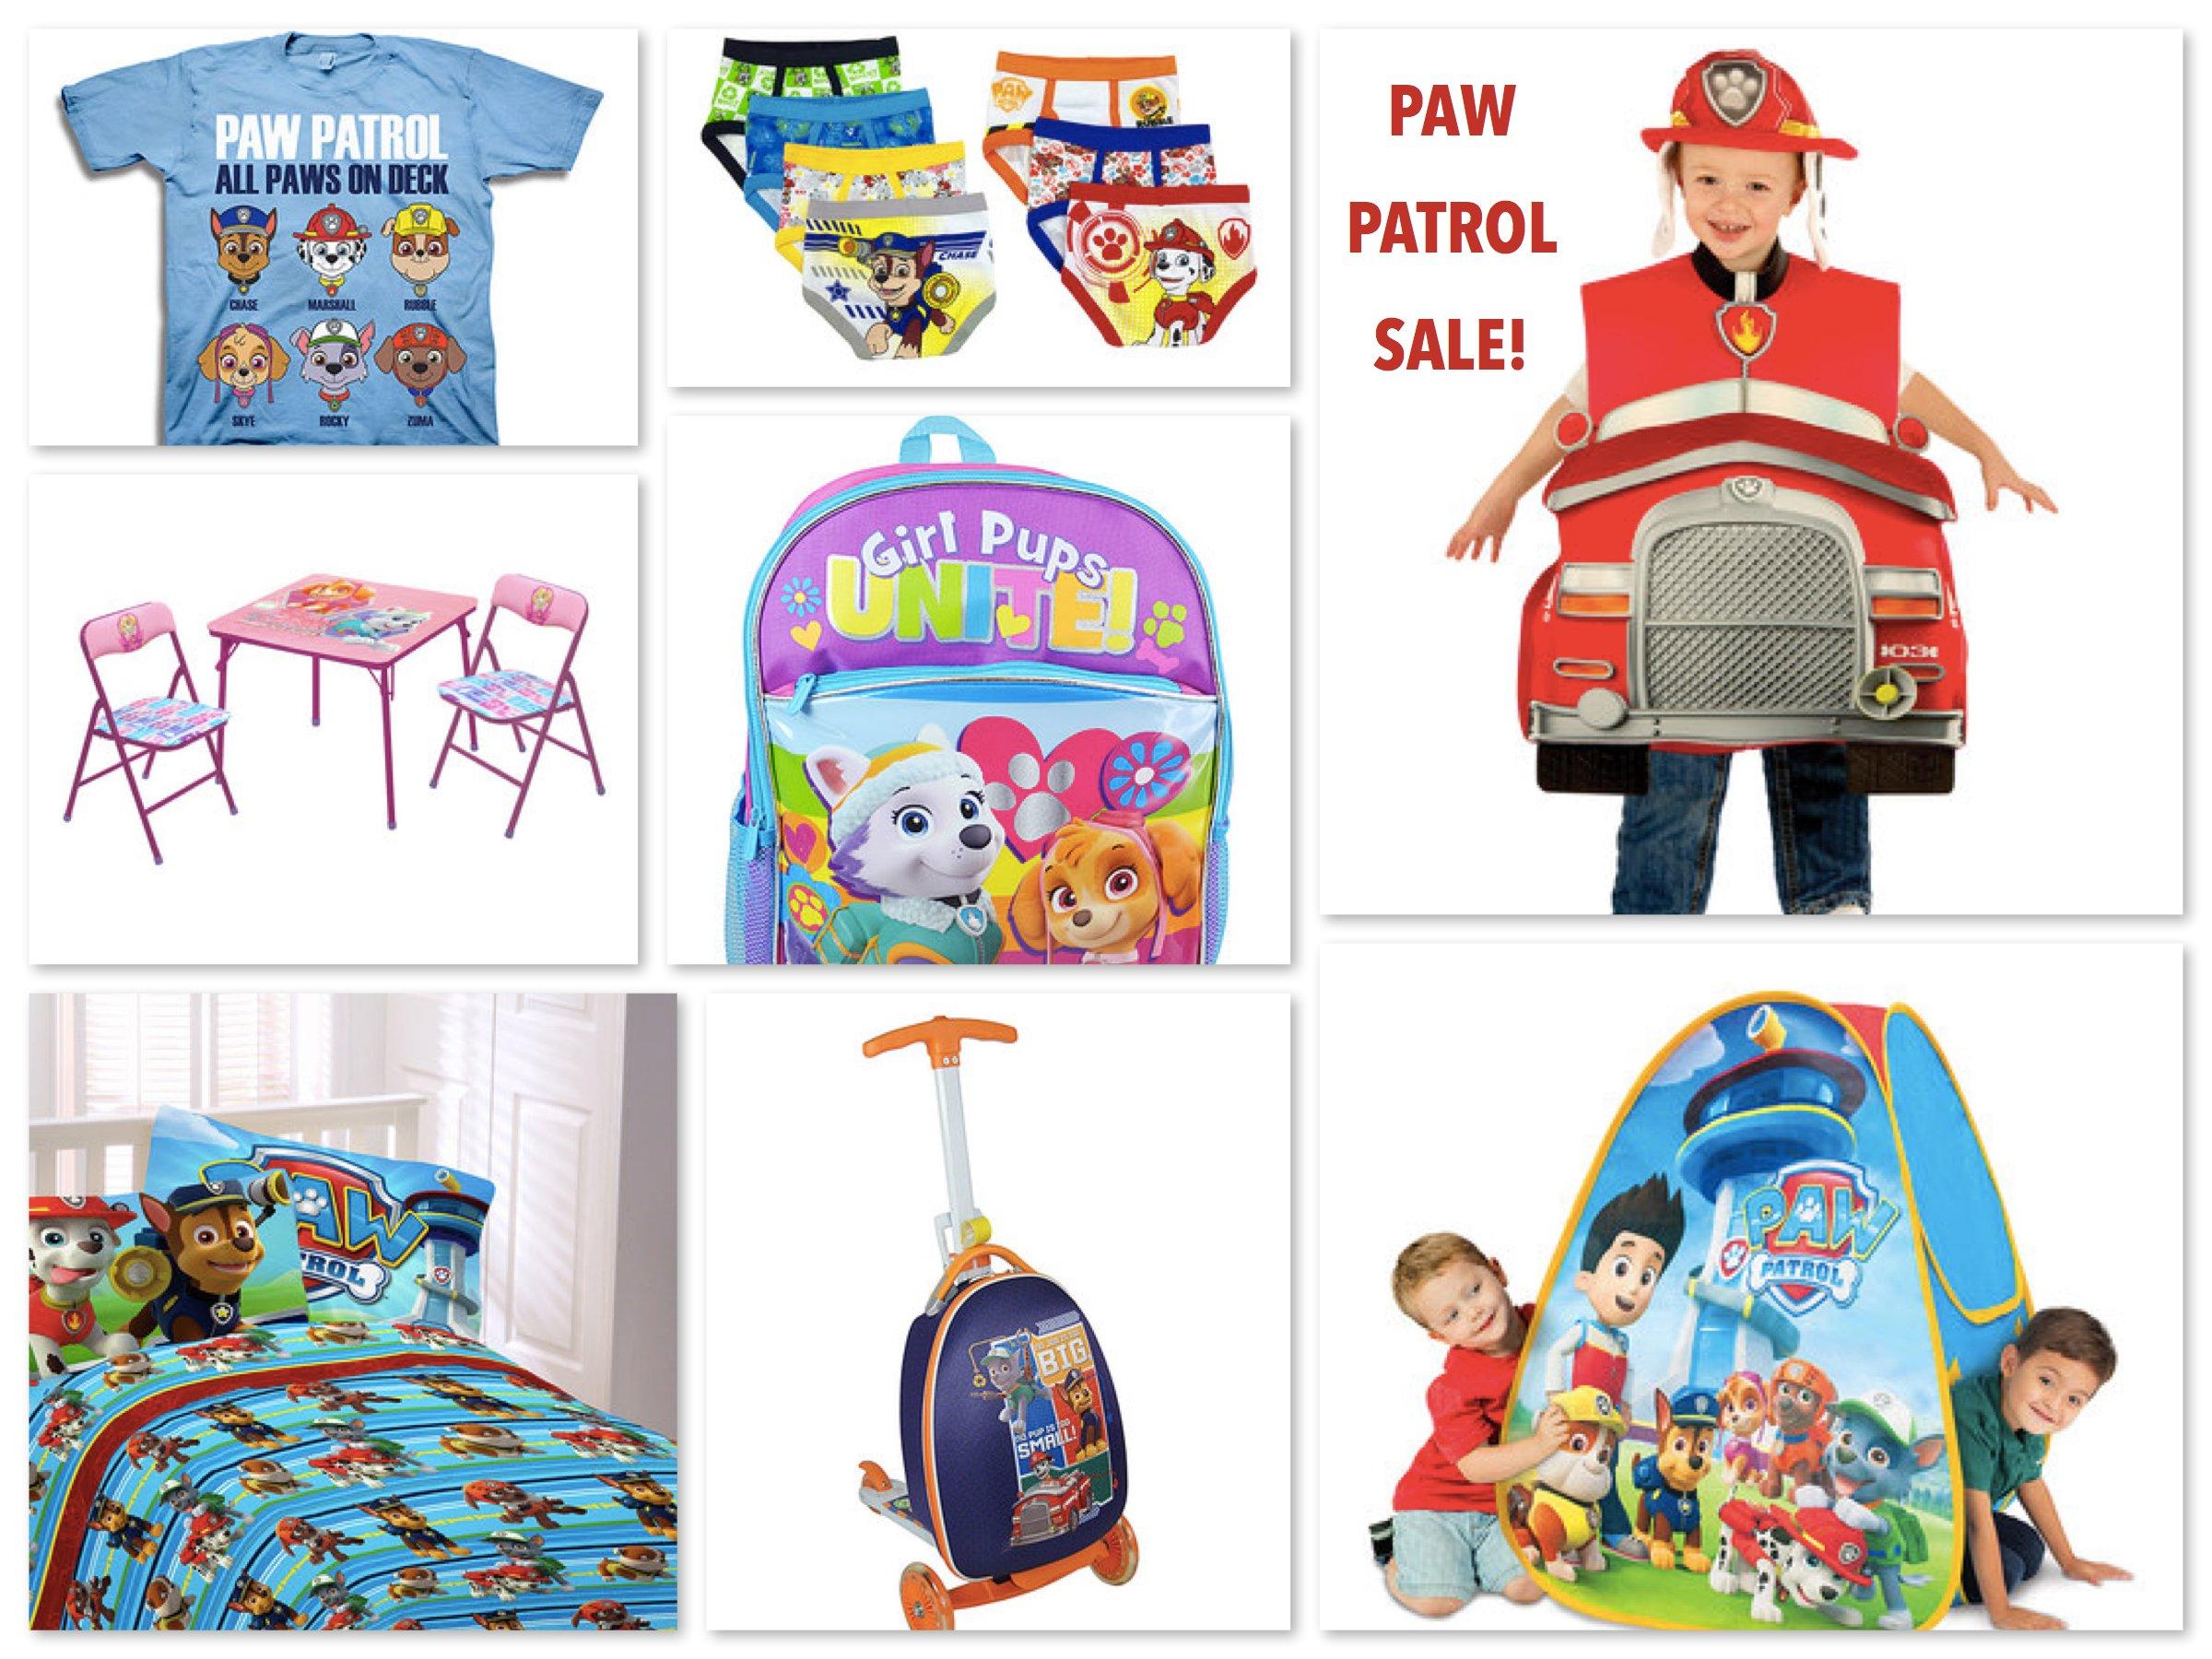 Paw Patrol Sale!